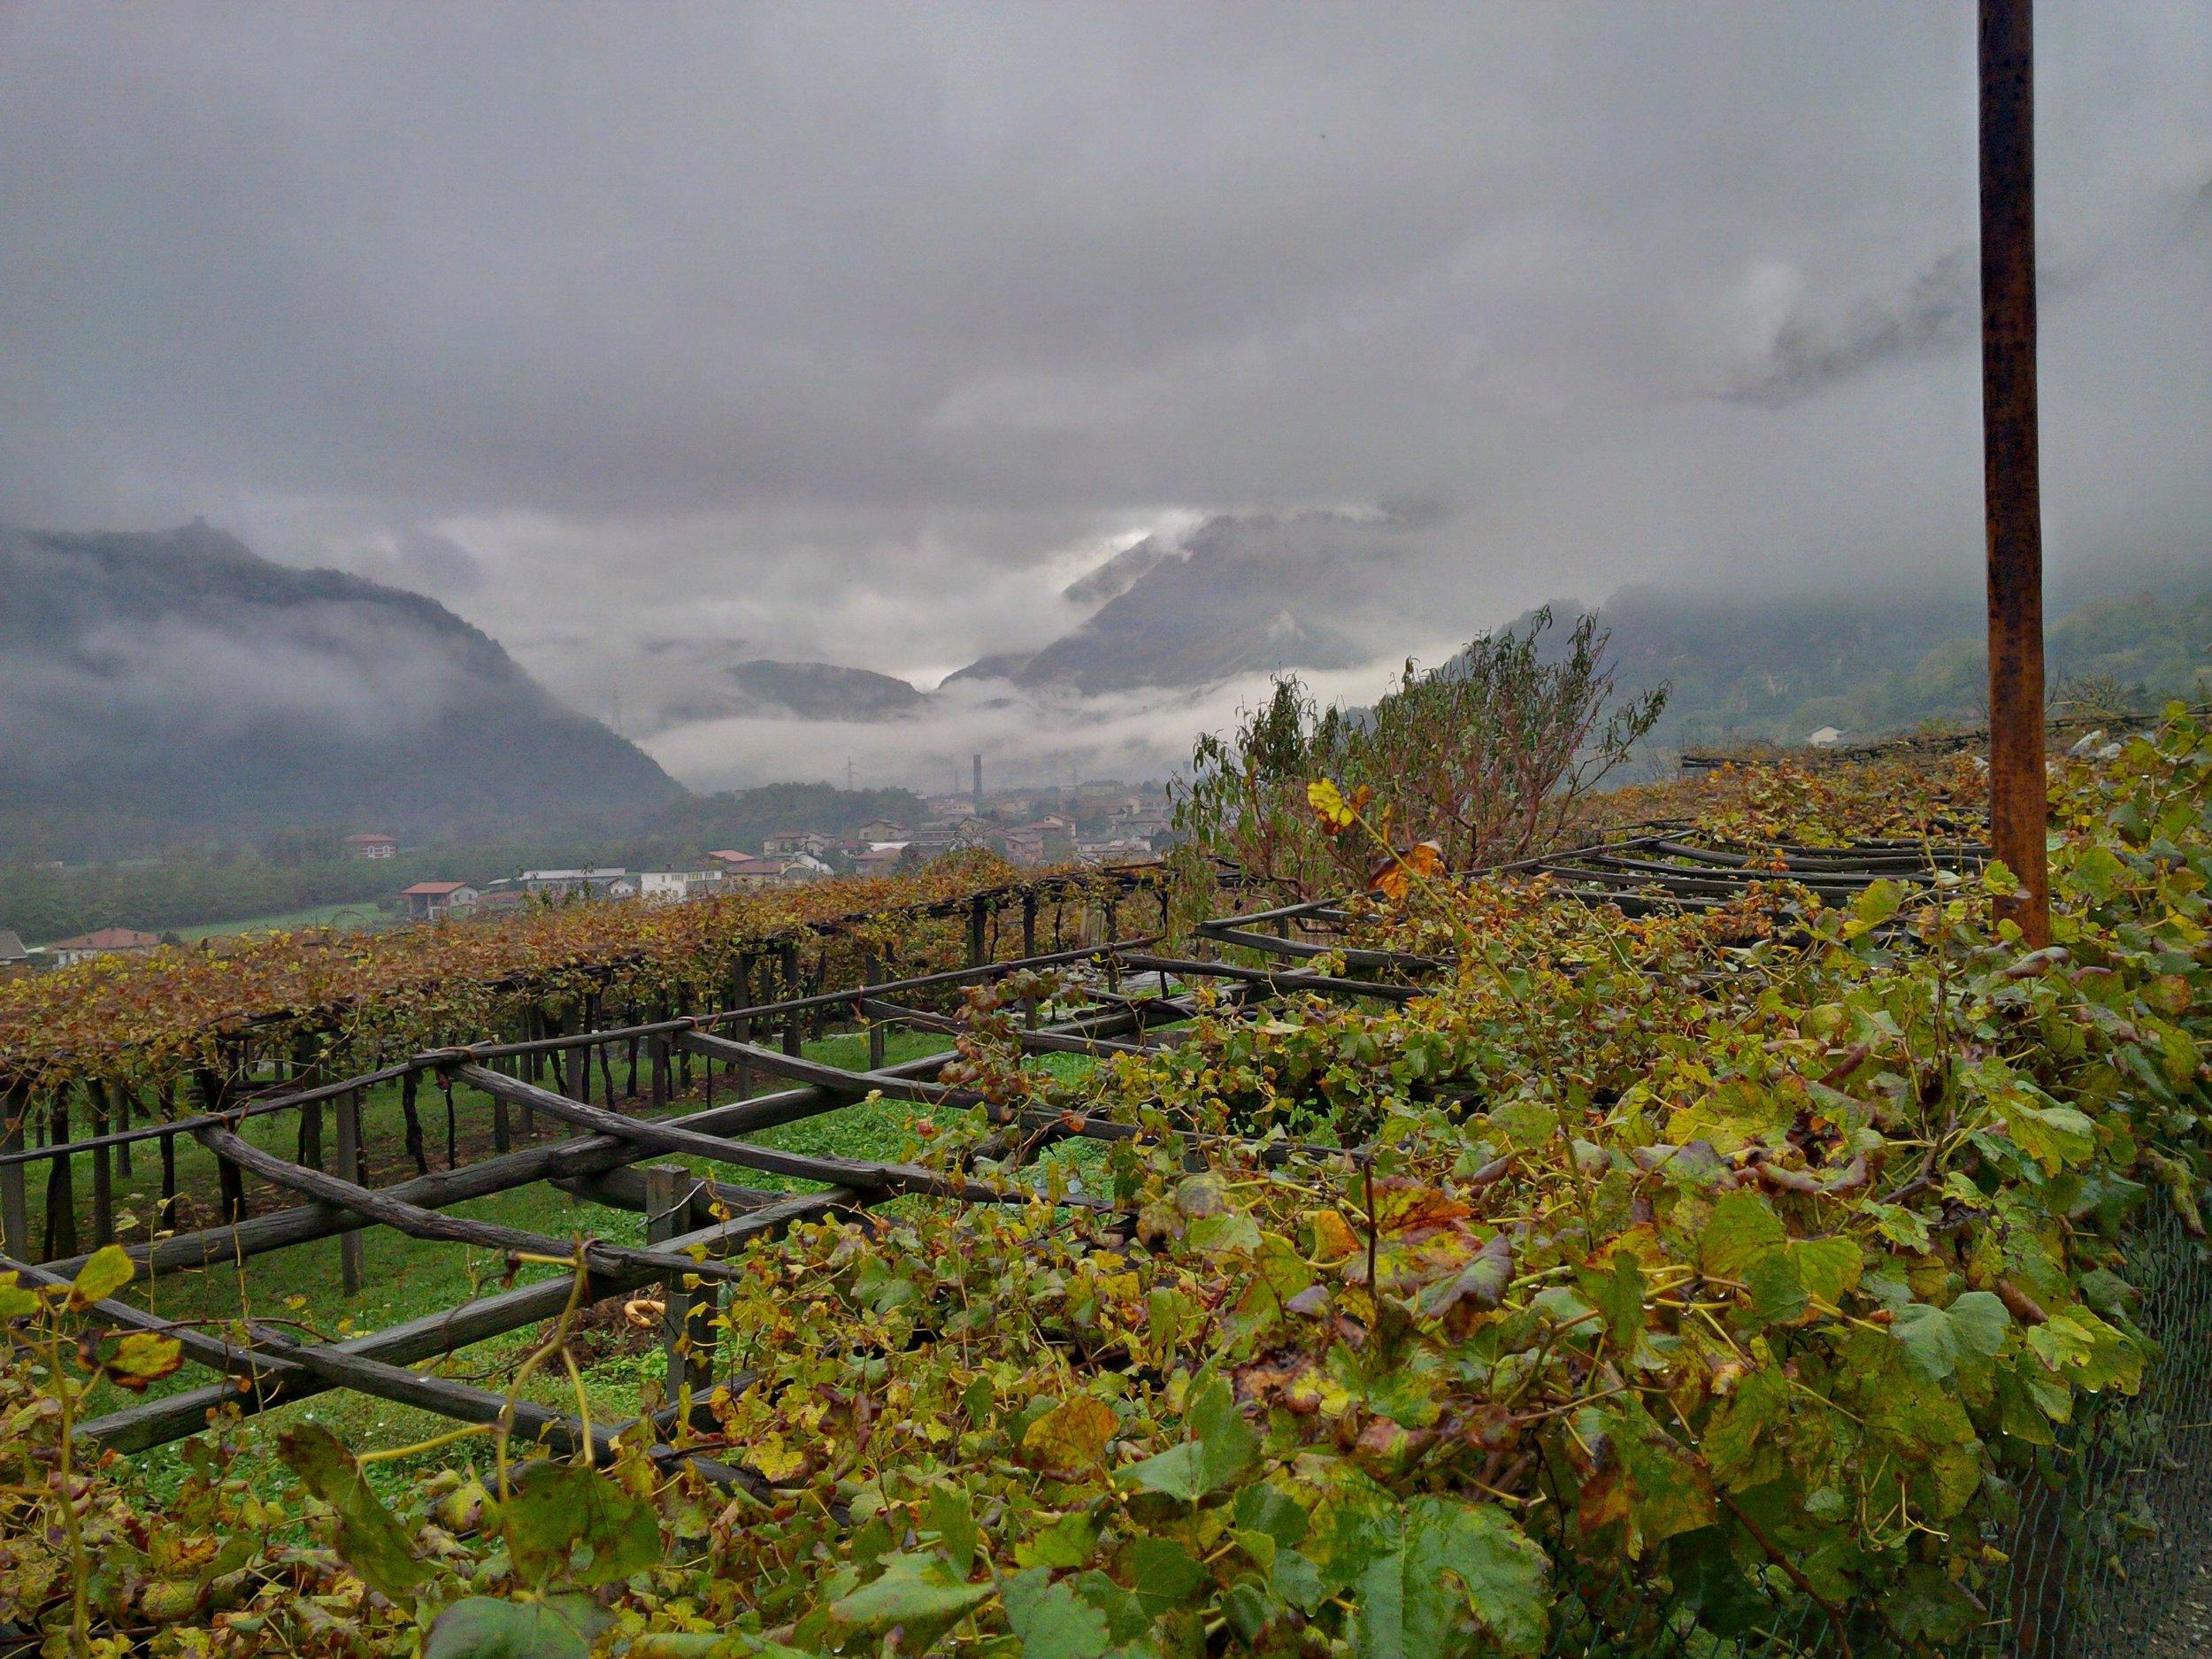 The vineyards at Luigi Ferrando's estate